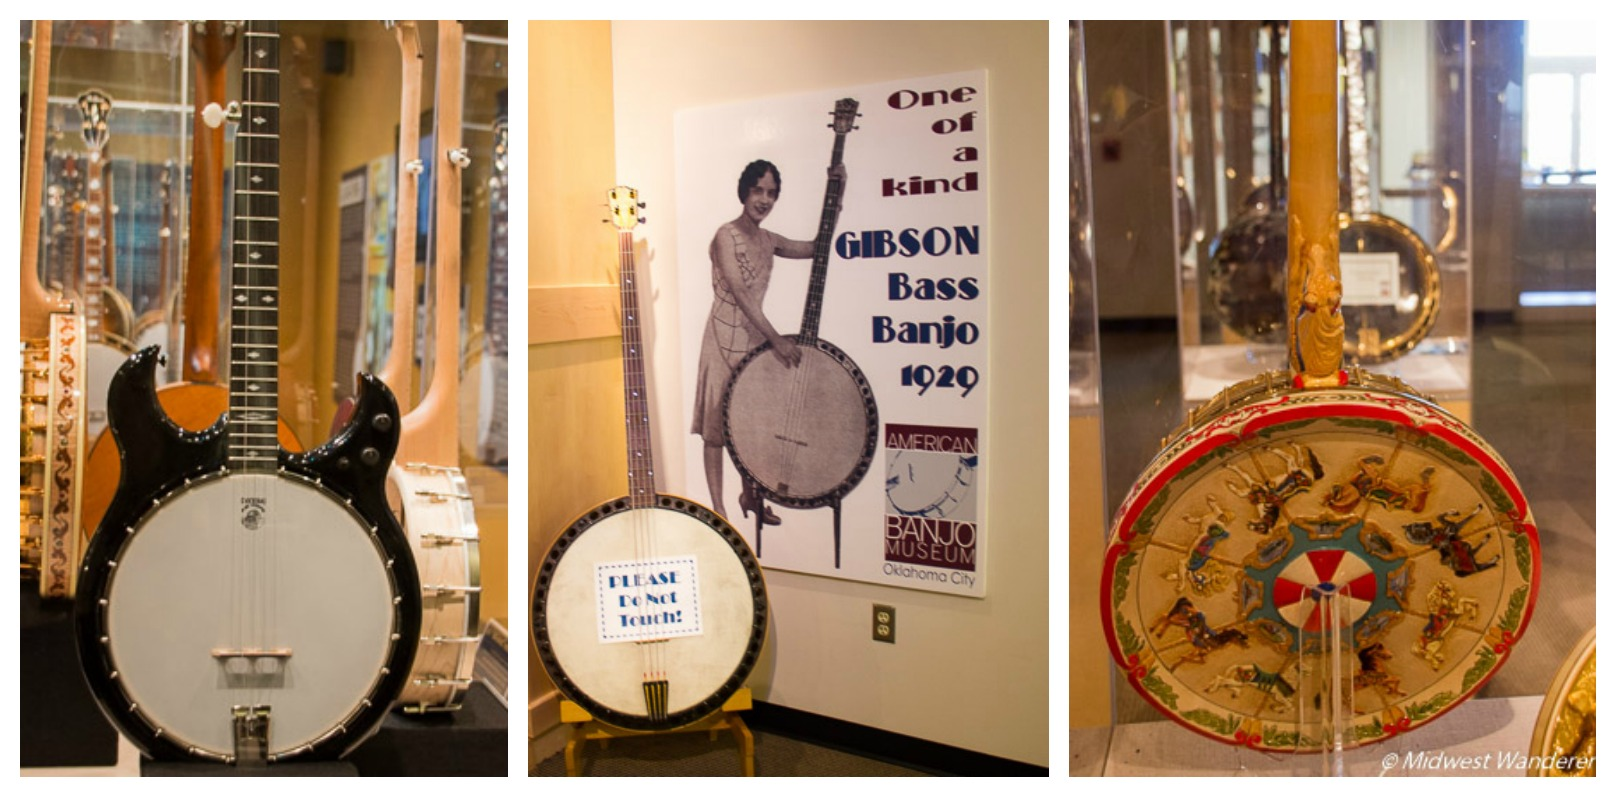 specialty banjos at the American Banjo Museum